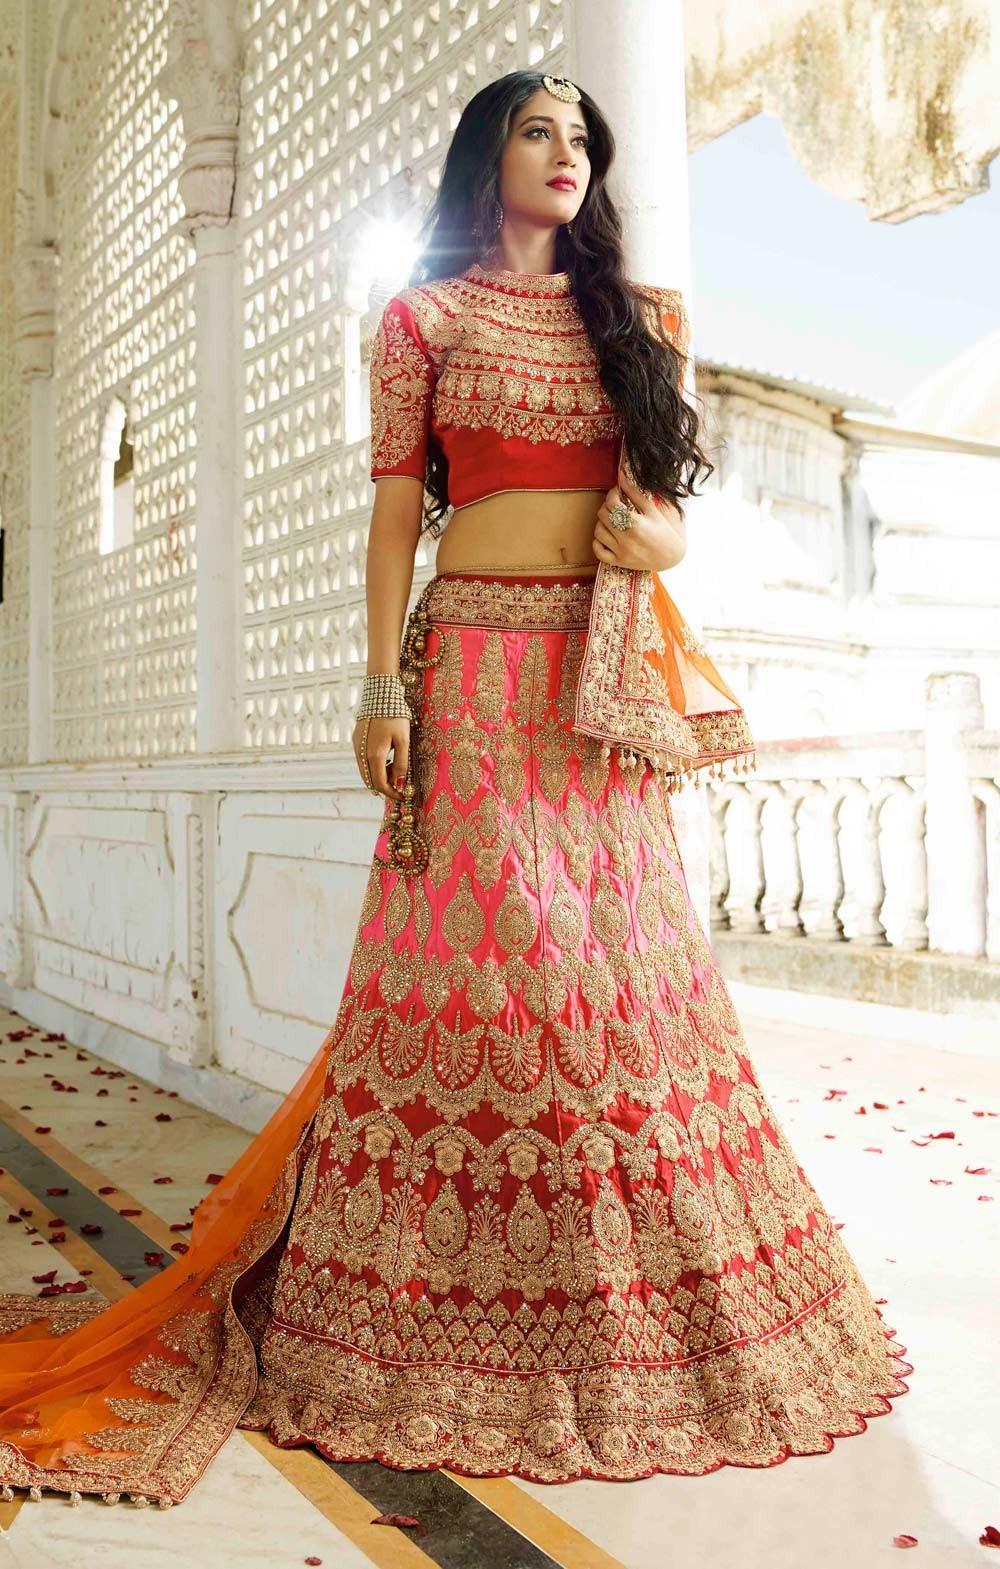 13 Stunning Indian Bridal Lehenga Choli Designs That Bride Must Have